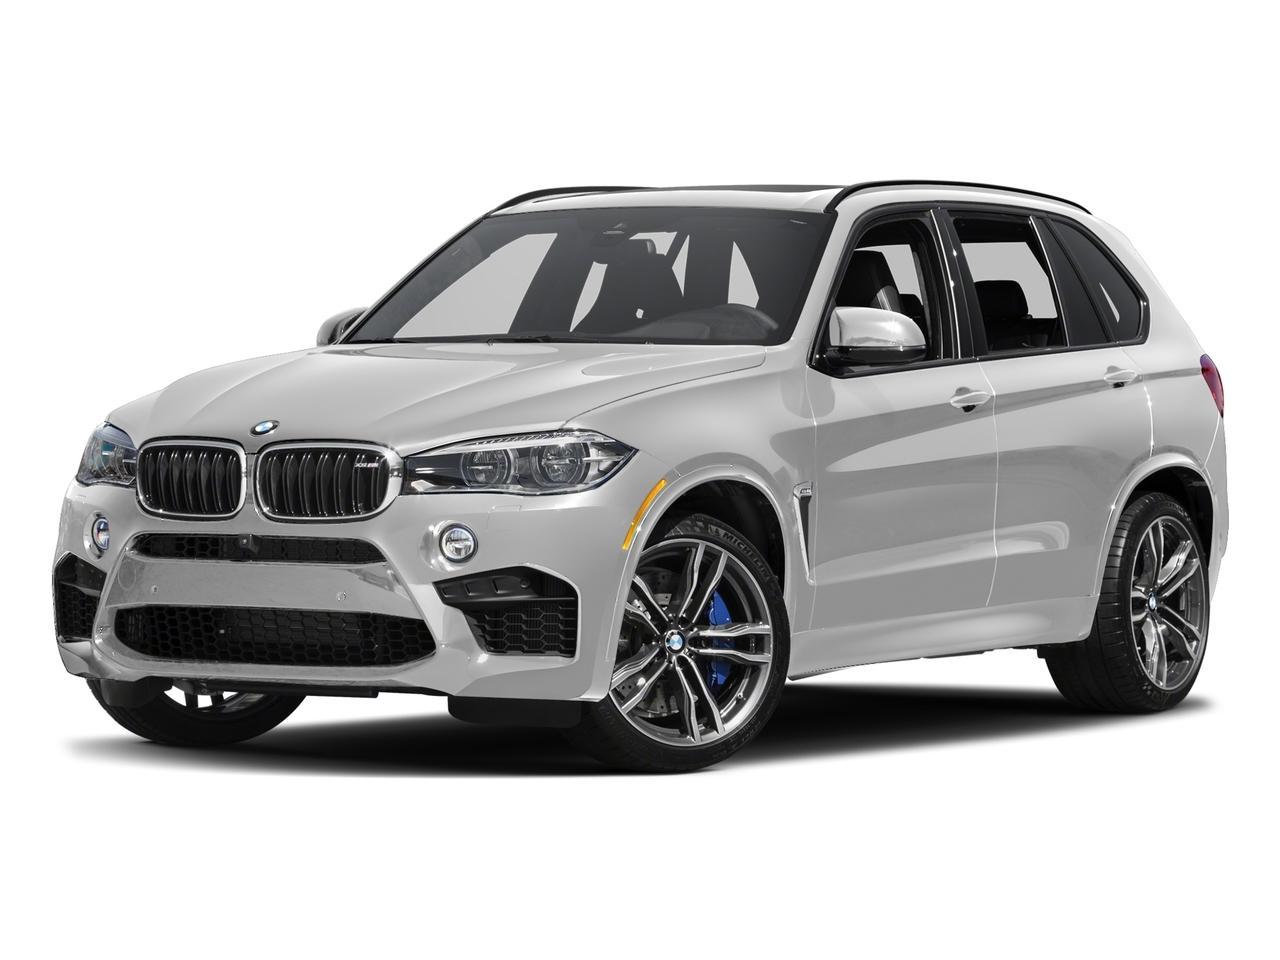 2017 BMW X5 M Vehicle Photo in Pleasanton, CA 94588